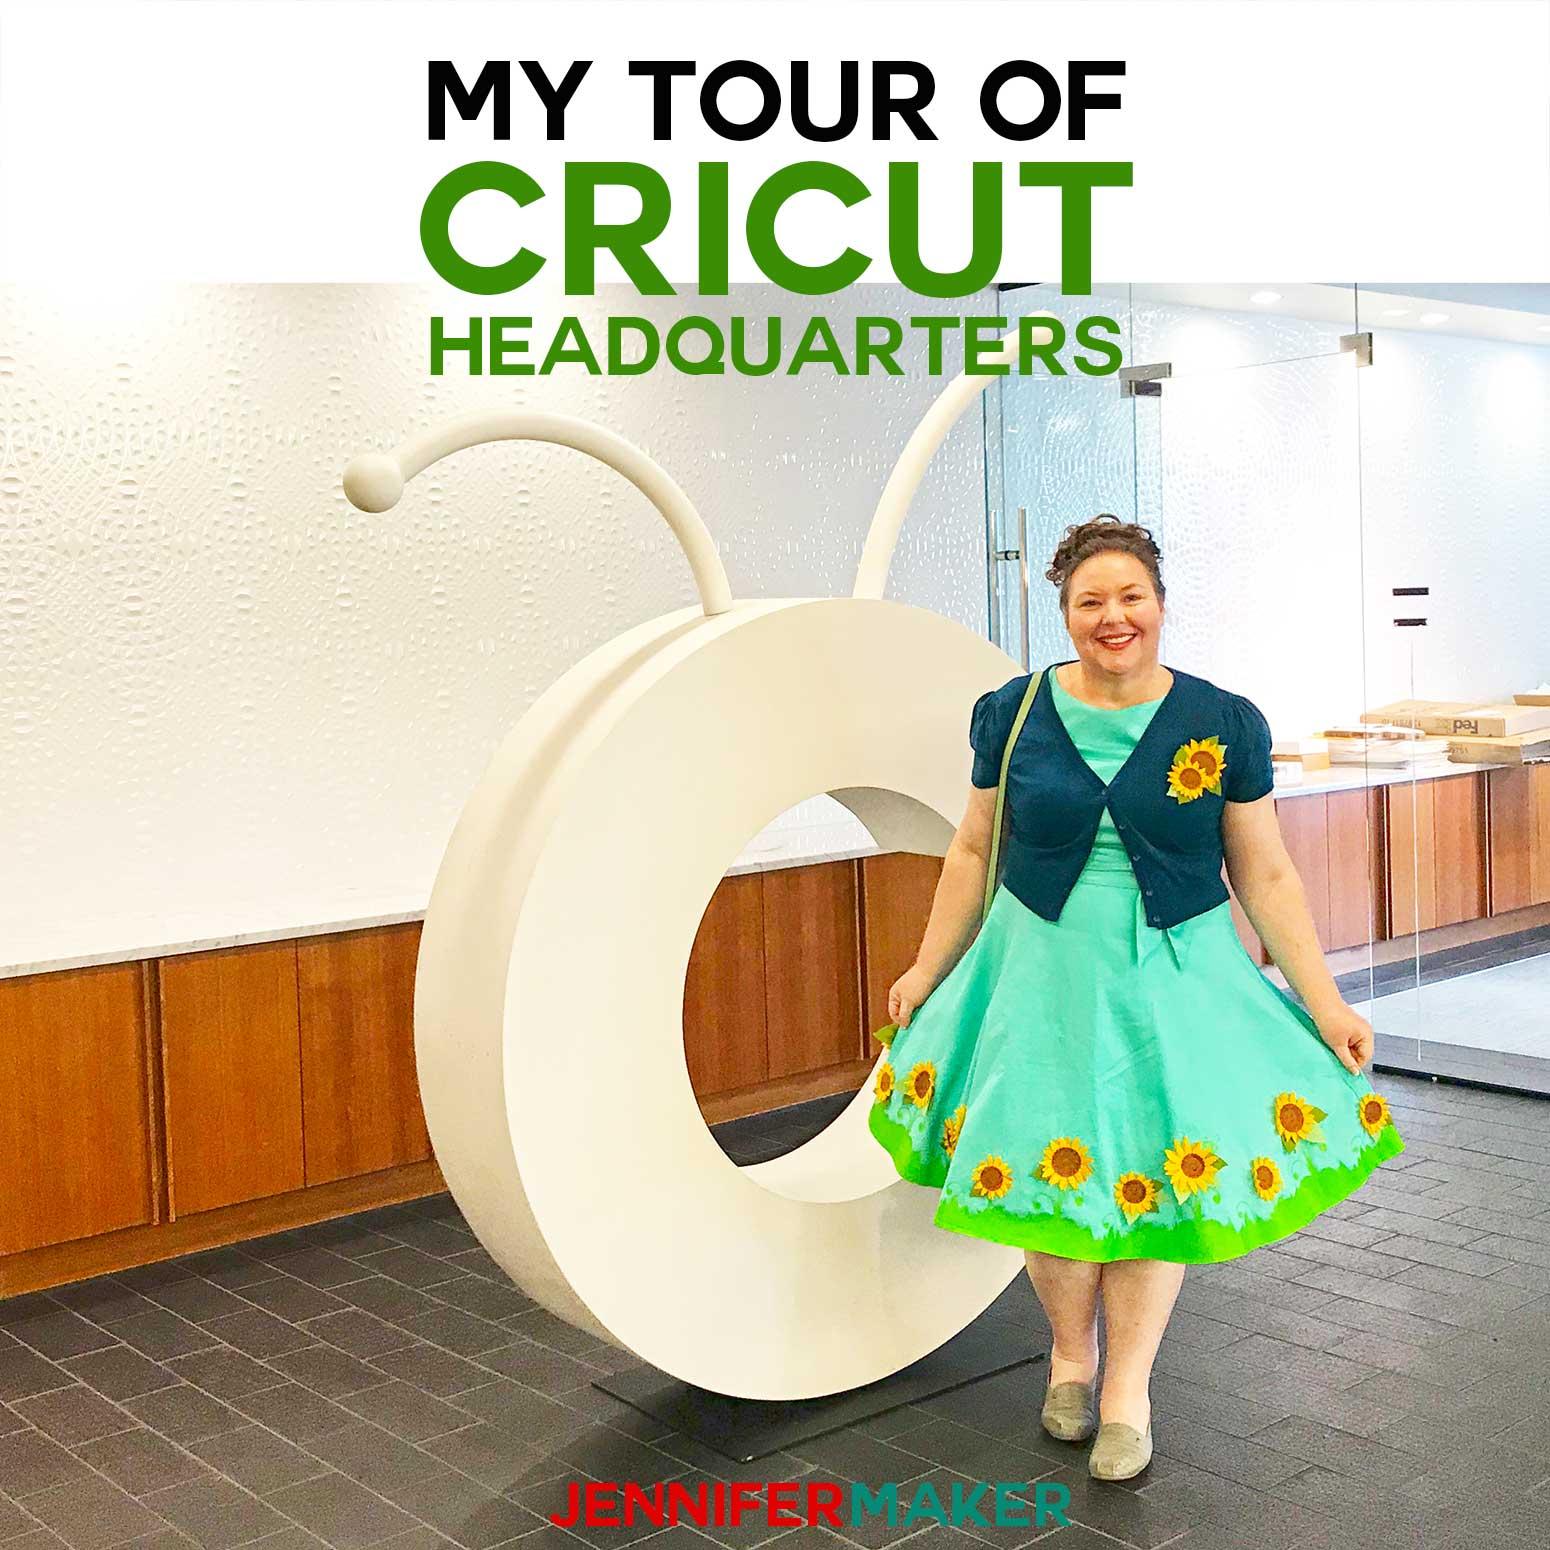 Cricut Headquarters Tour with JenniferMaker